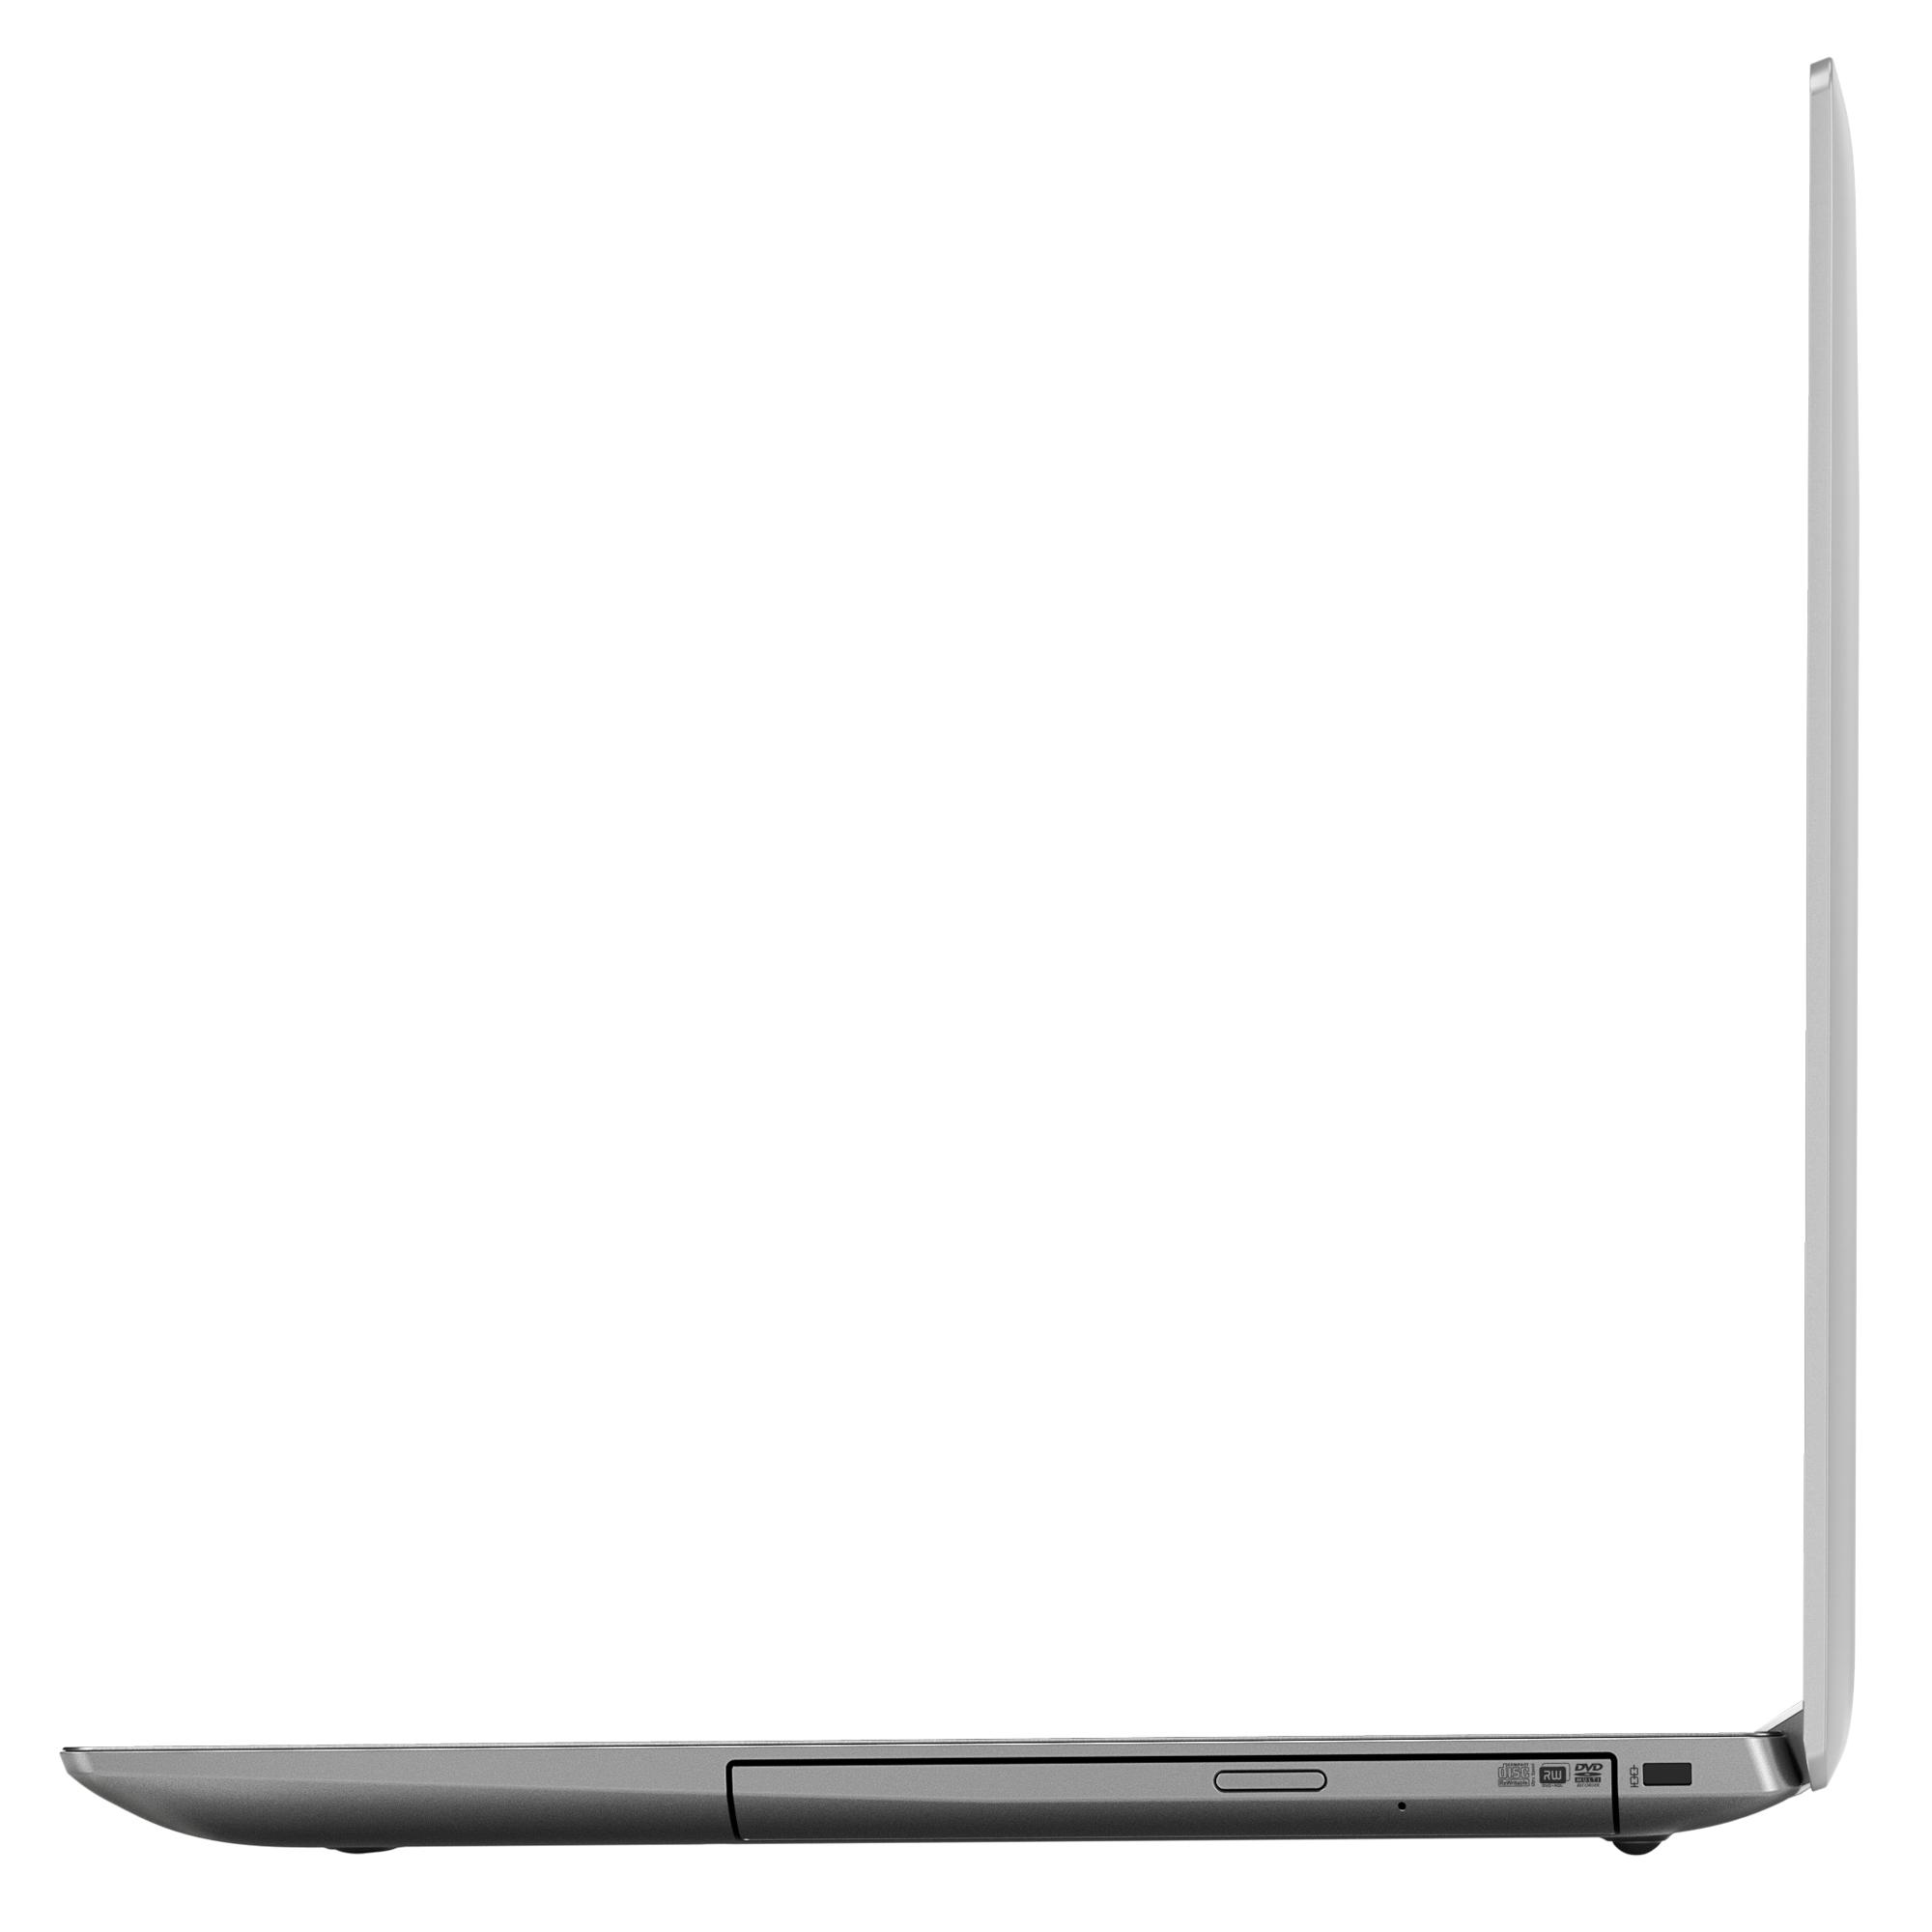 Фото  Ноутбук Lenovo ideapad 330-15 Platinum Grey (81DC012DRA)